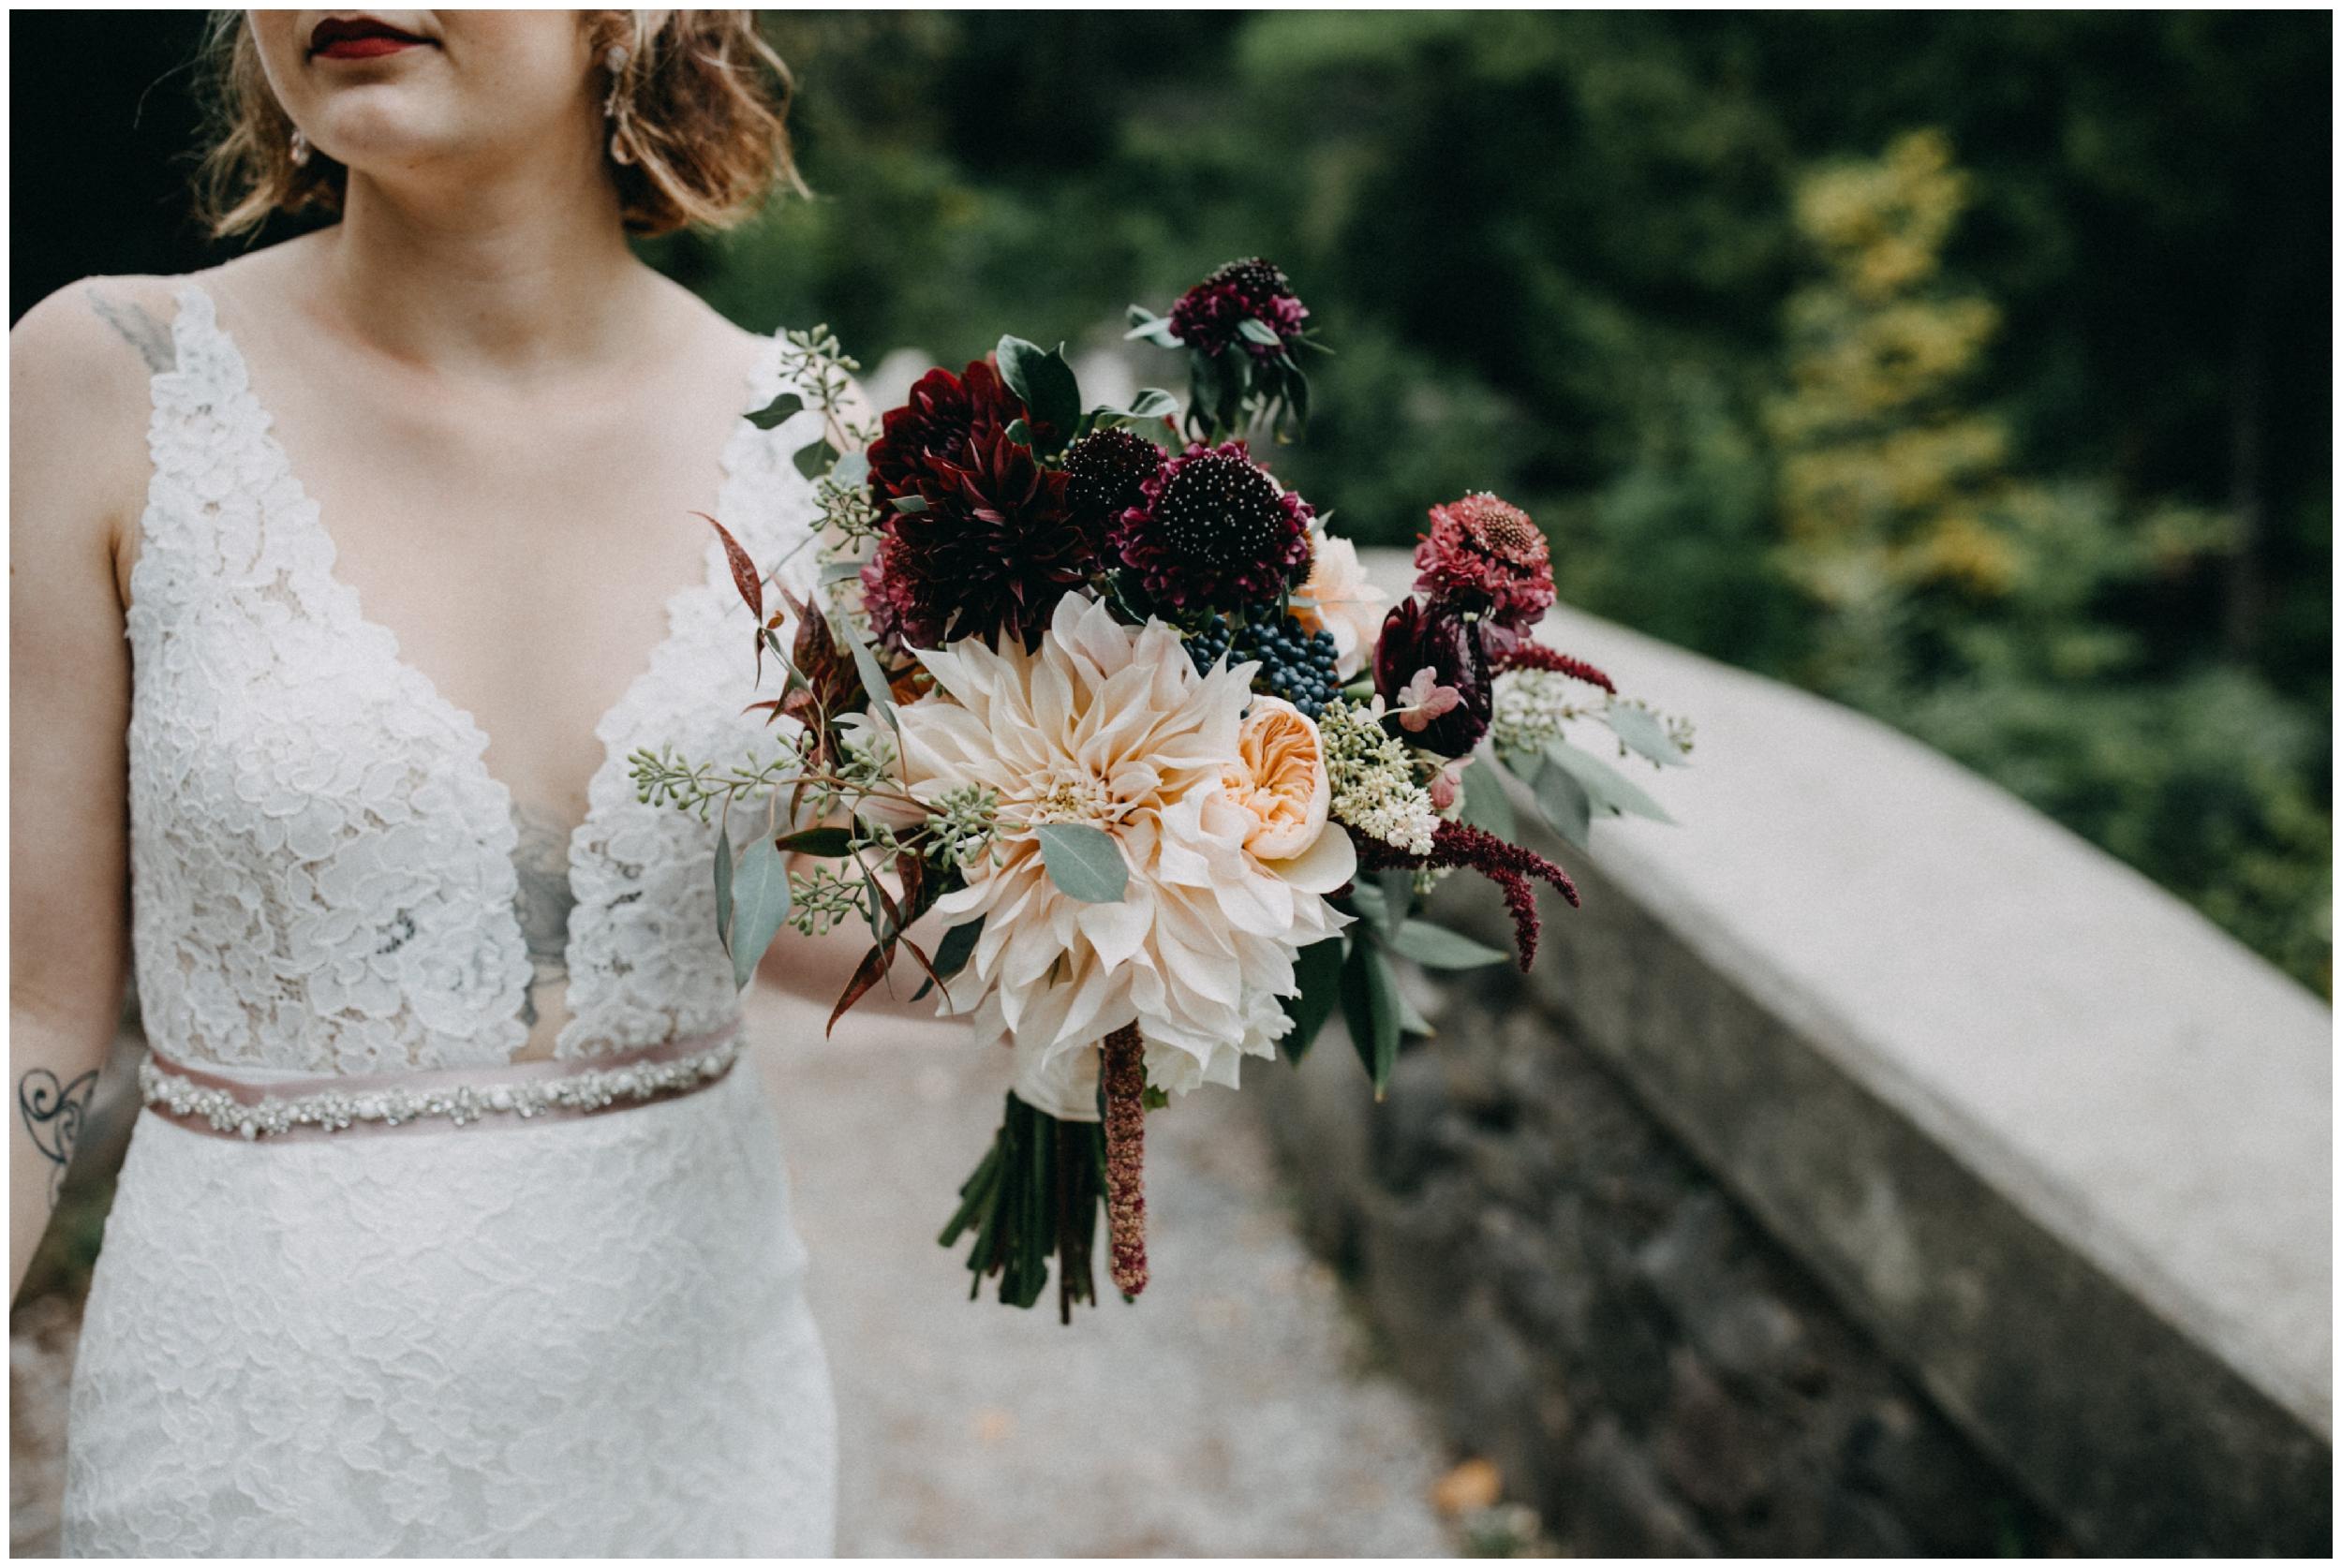 Untraditional wedding in Duluth photographed by Britt DeZeeuw